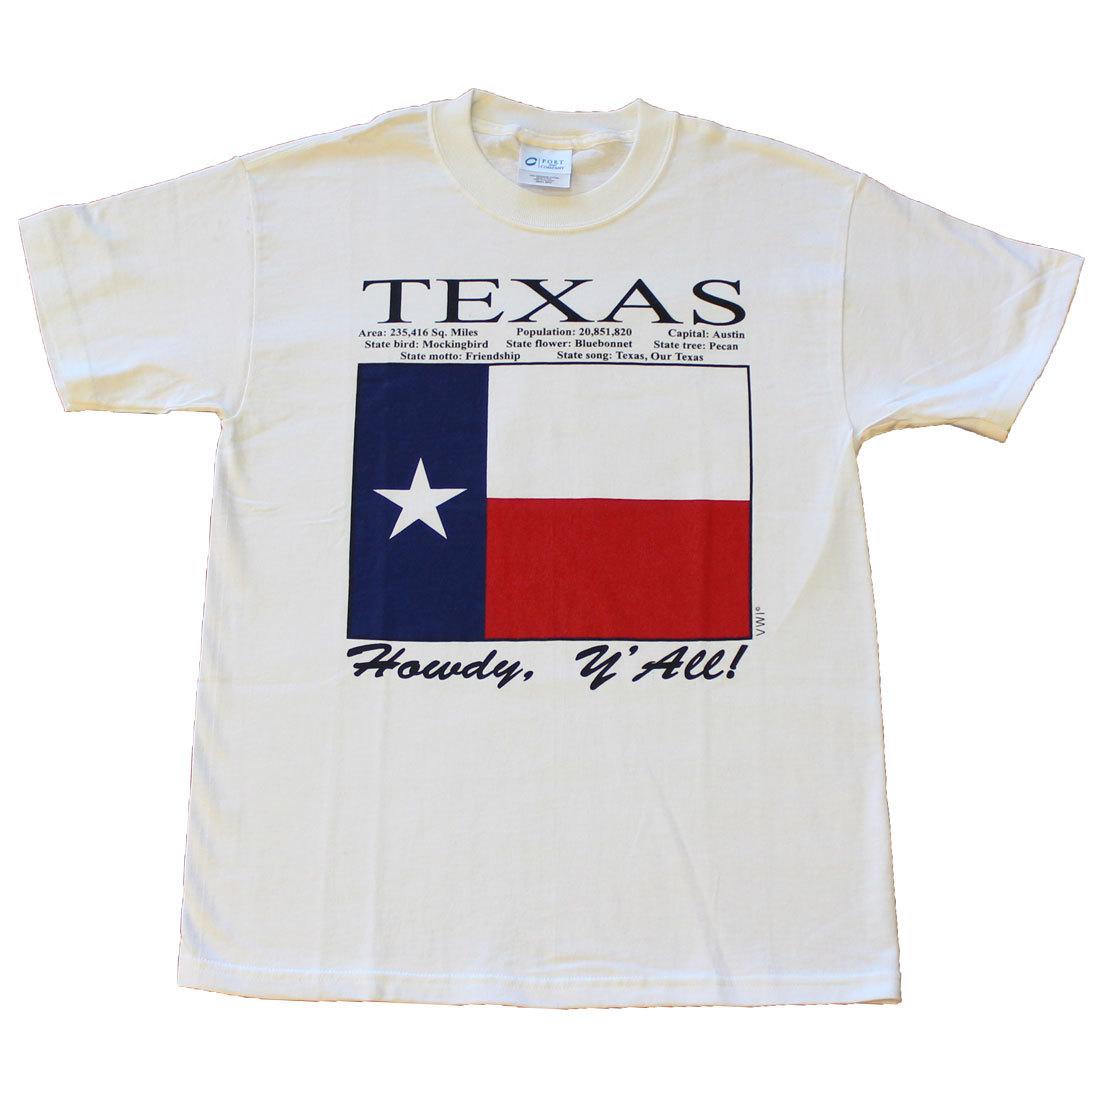 Texas State T-Shirt (M)